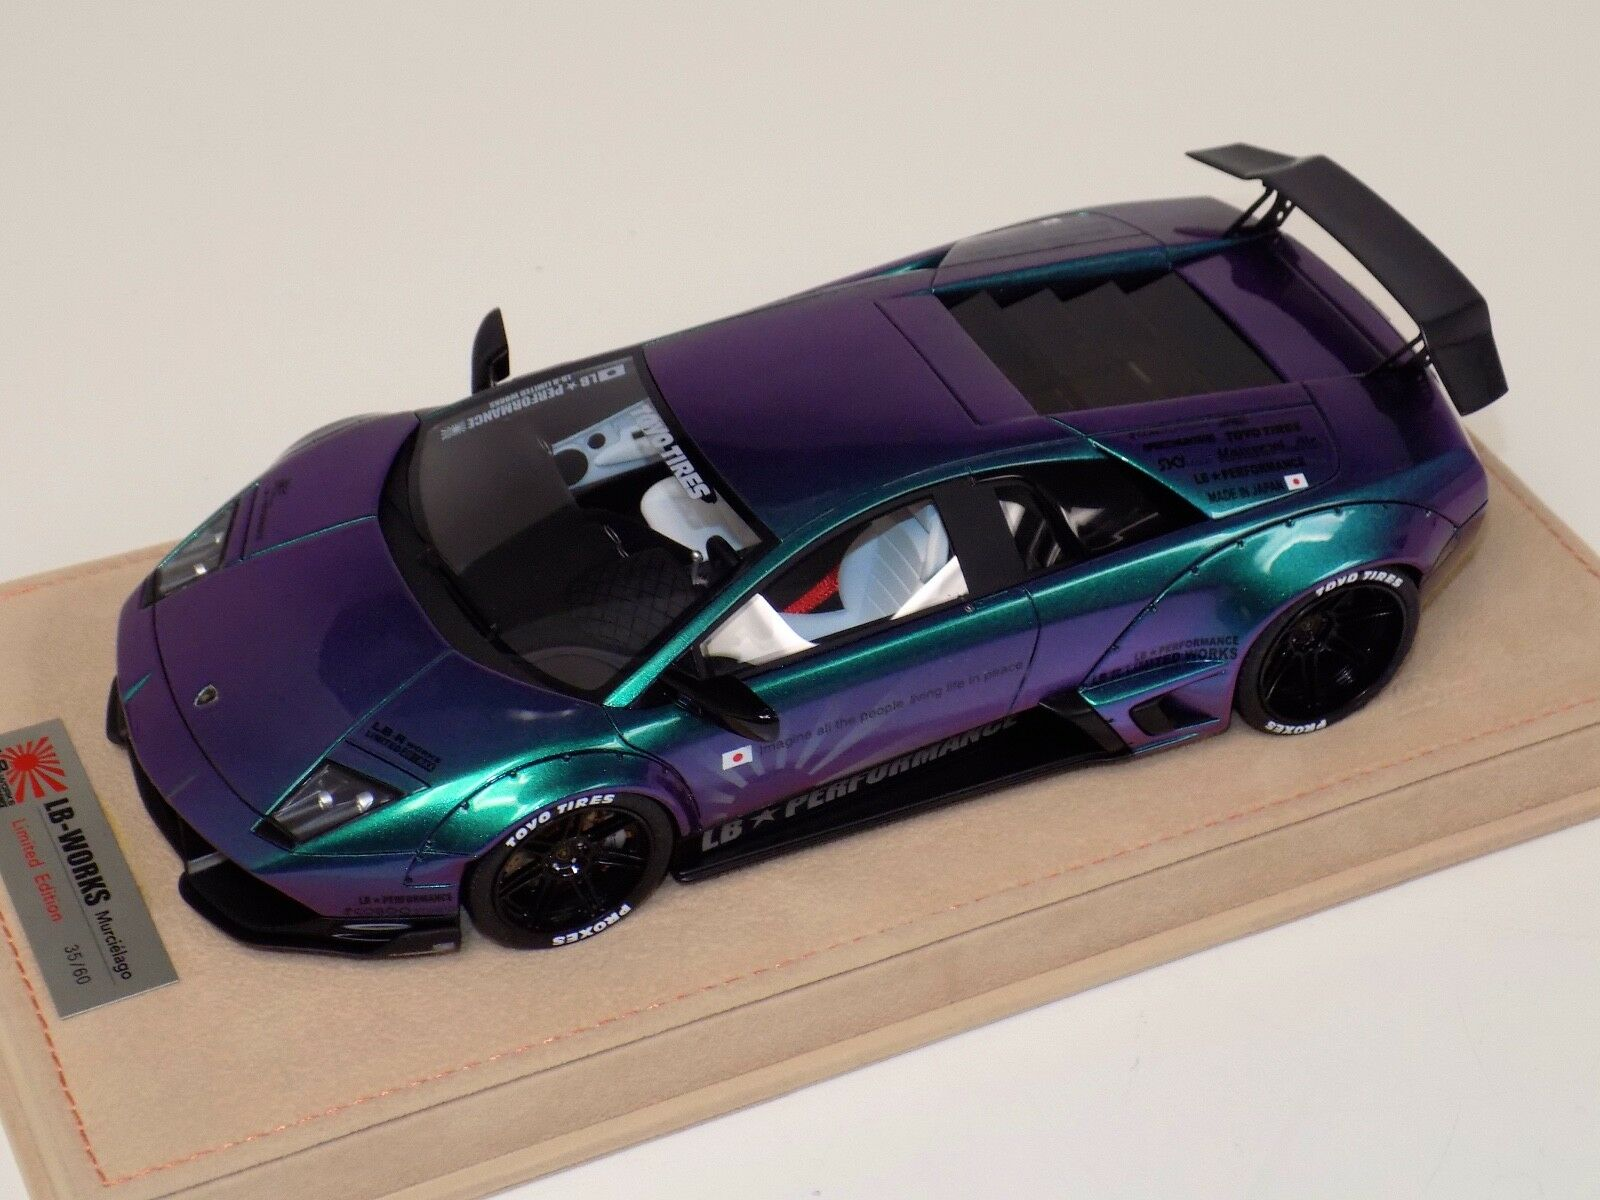 1 18 Lamborghini Murcielago Liberty Walk LB Performance in Chameleon  BBR or MR